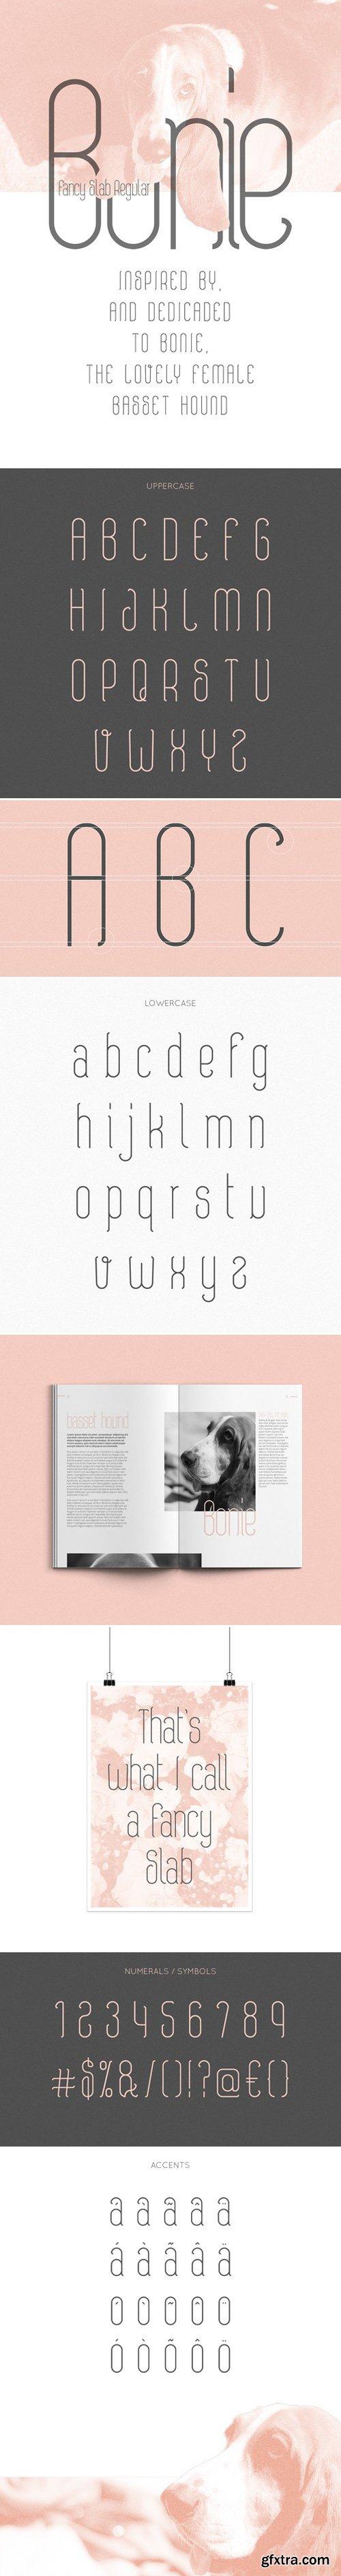 Bonie Typeface